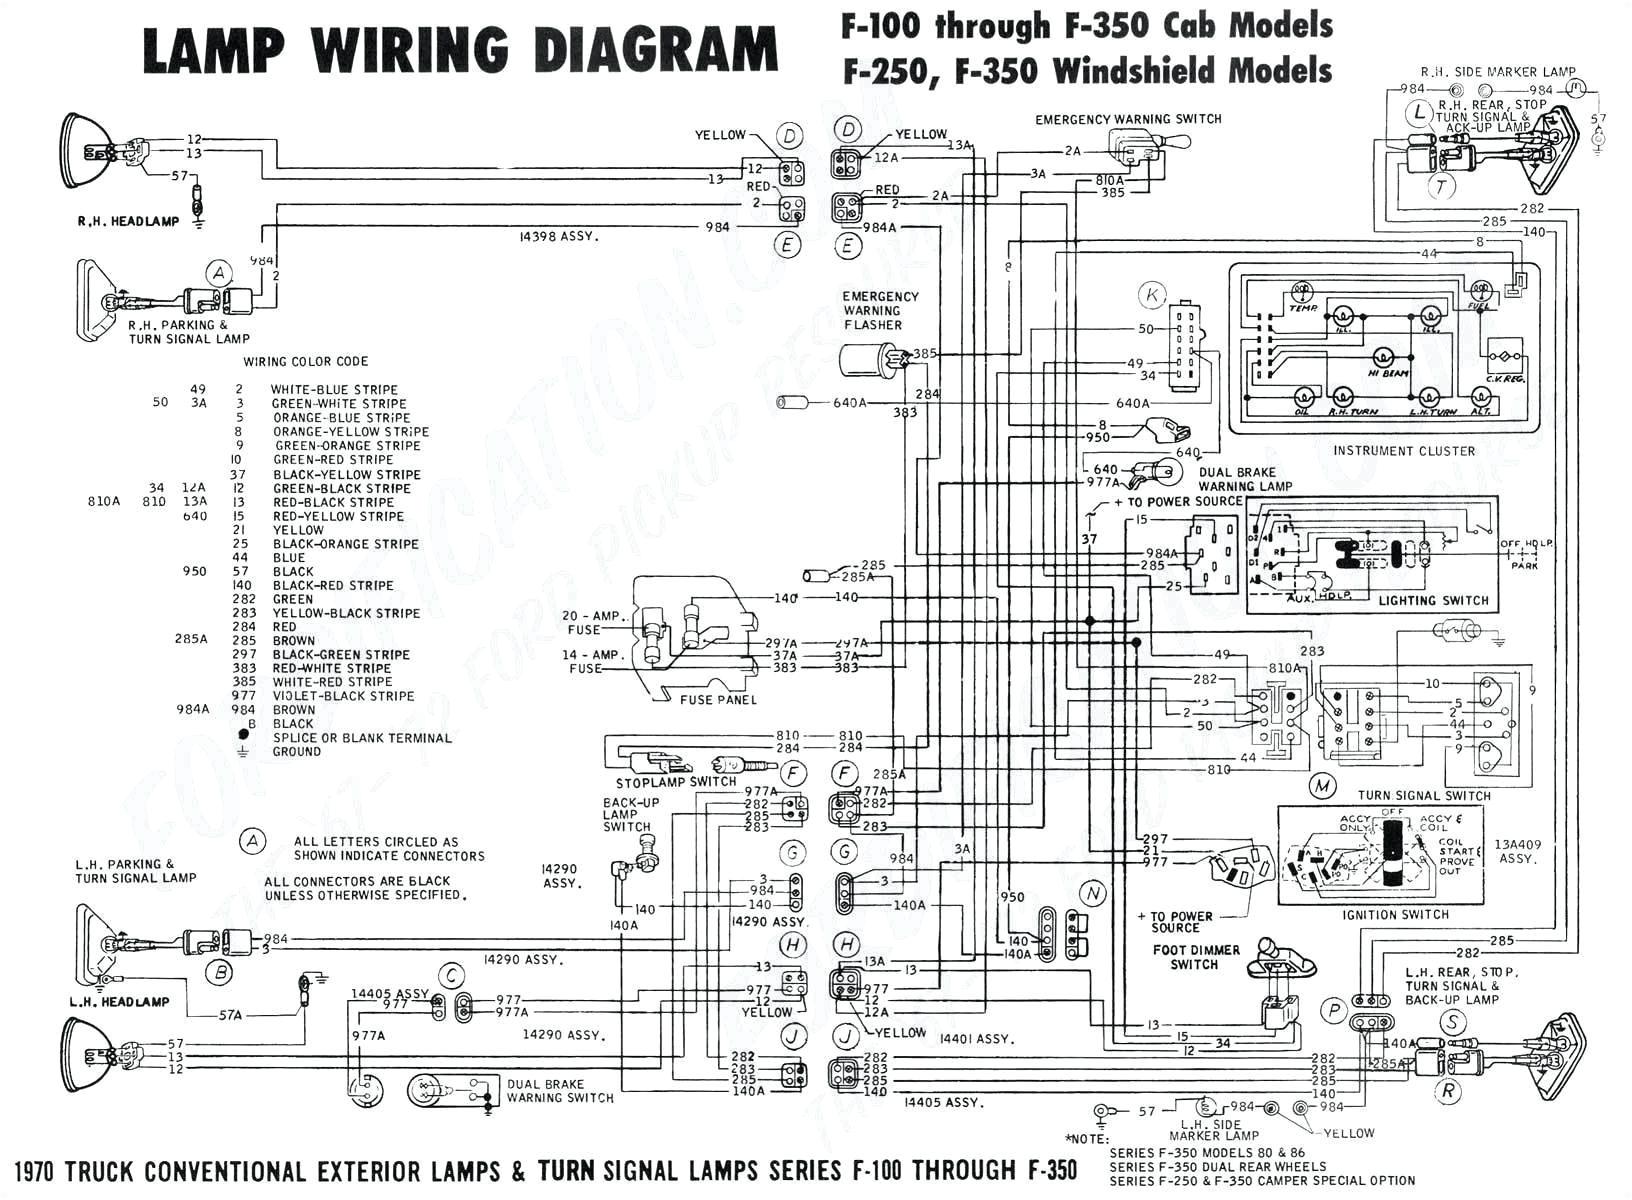 2000 dodge durango map sensor location free download wiring wiring 2000 dodge durango turn signal flasher location free download wiring